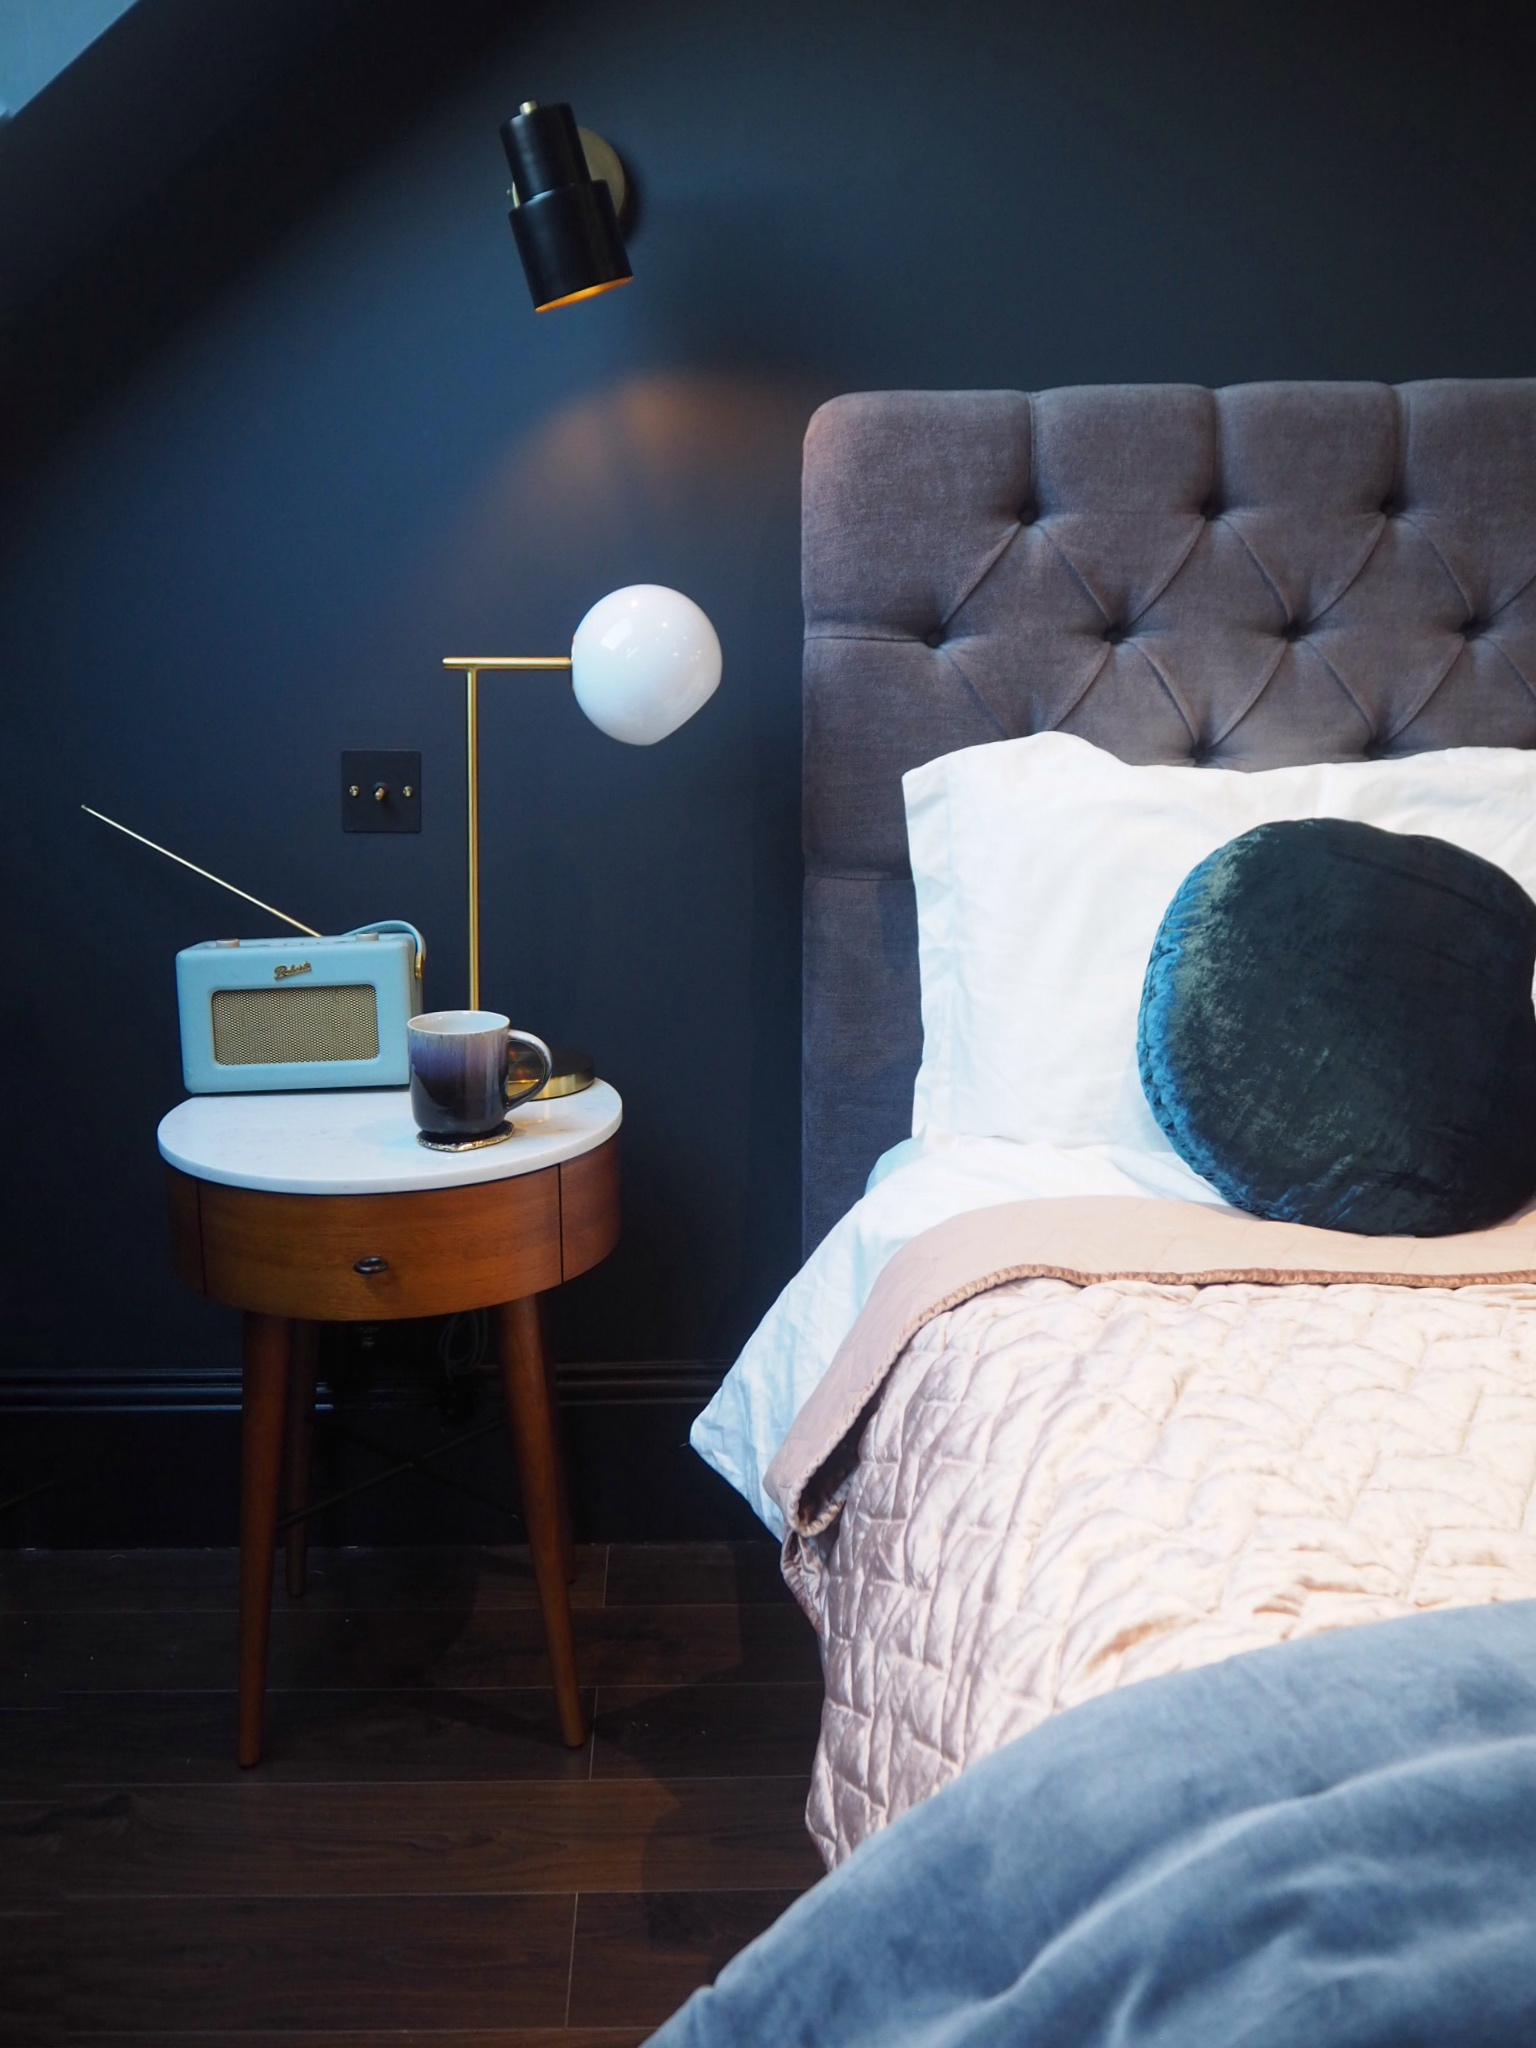 Penelope bedside tables   £349, West Elm,   Staggered glass table lamp   £99, West Elm.   Ombre Reactive glaze mug   £10 from West Elm,   Agate blue/ gold coasters   - pack of 4 £54